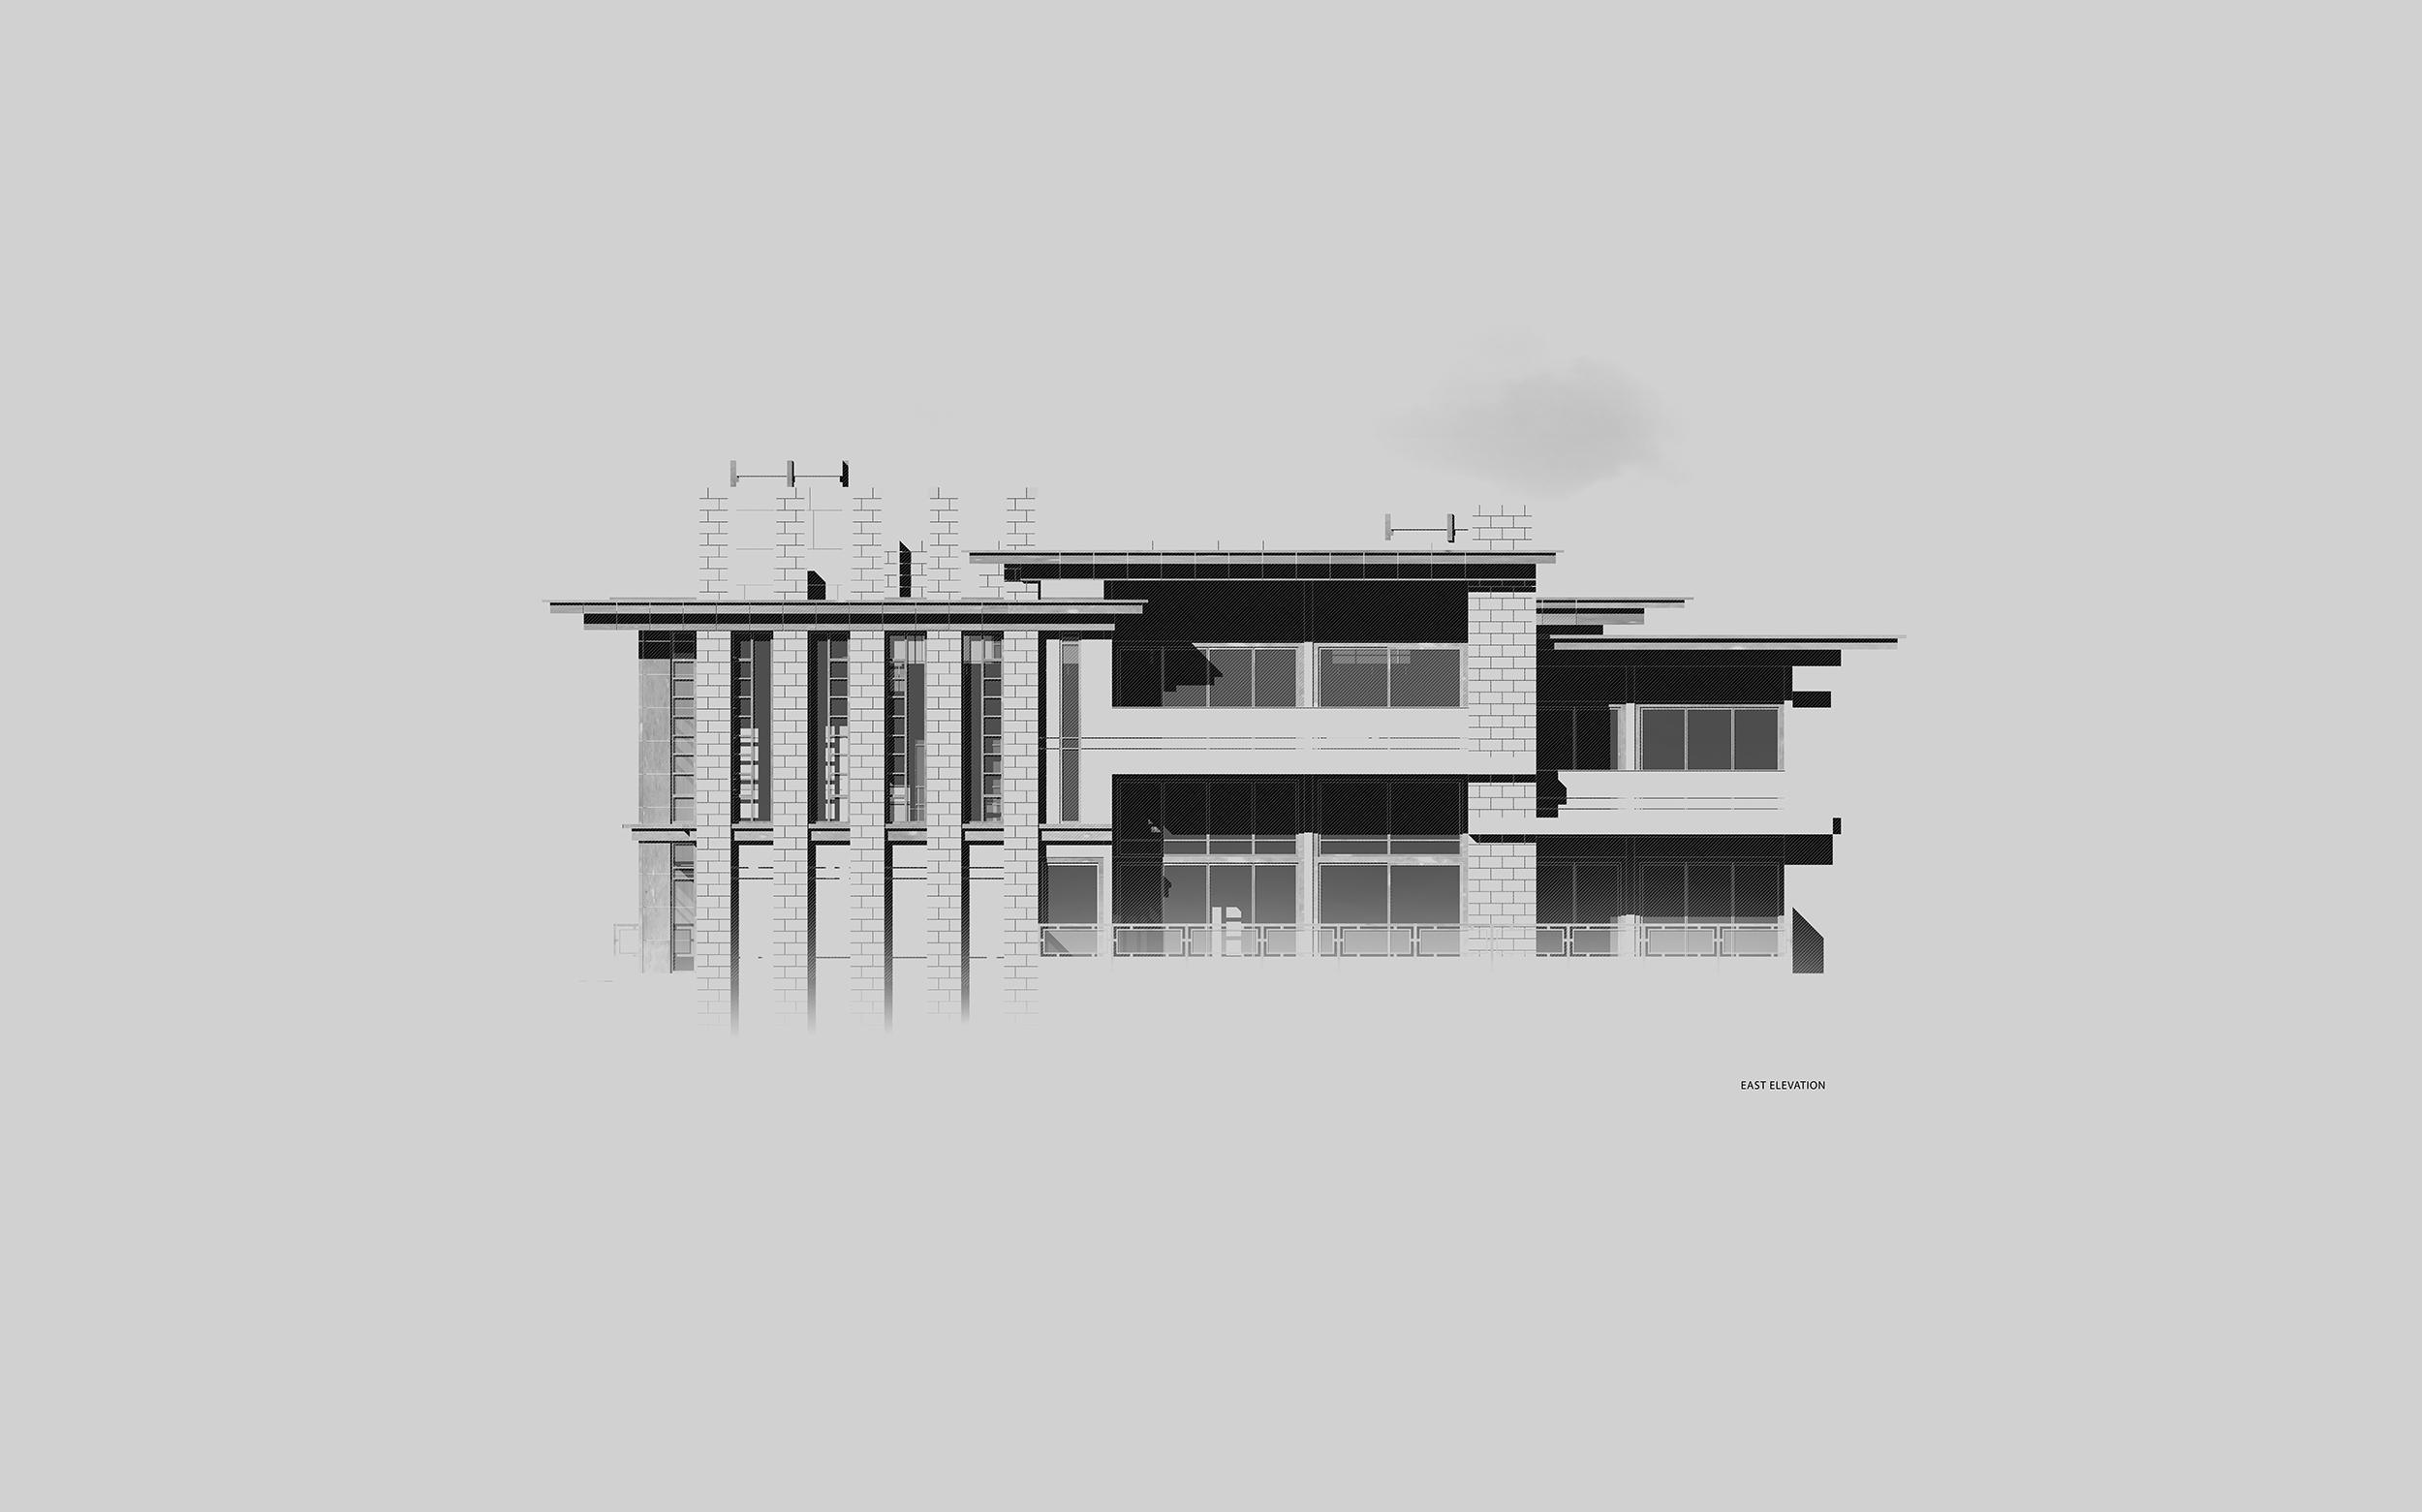 malibu-house-archillusion-design-elevation-01.jpg